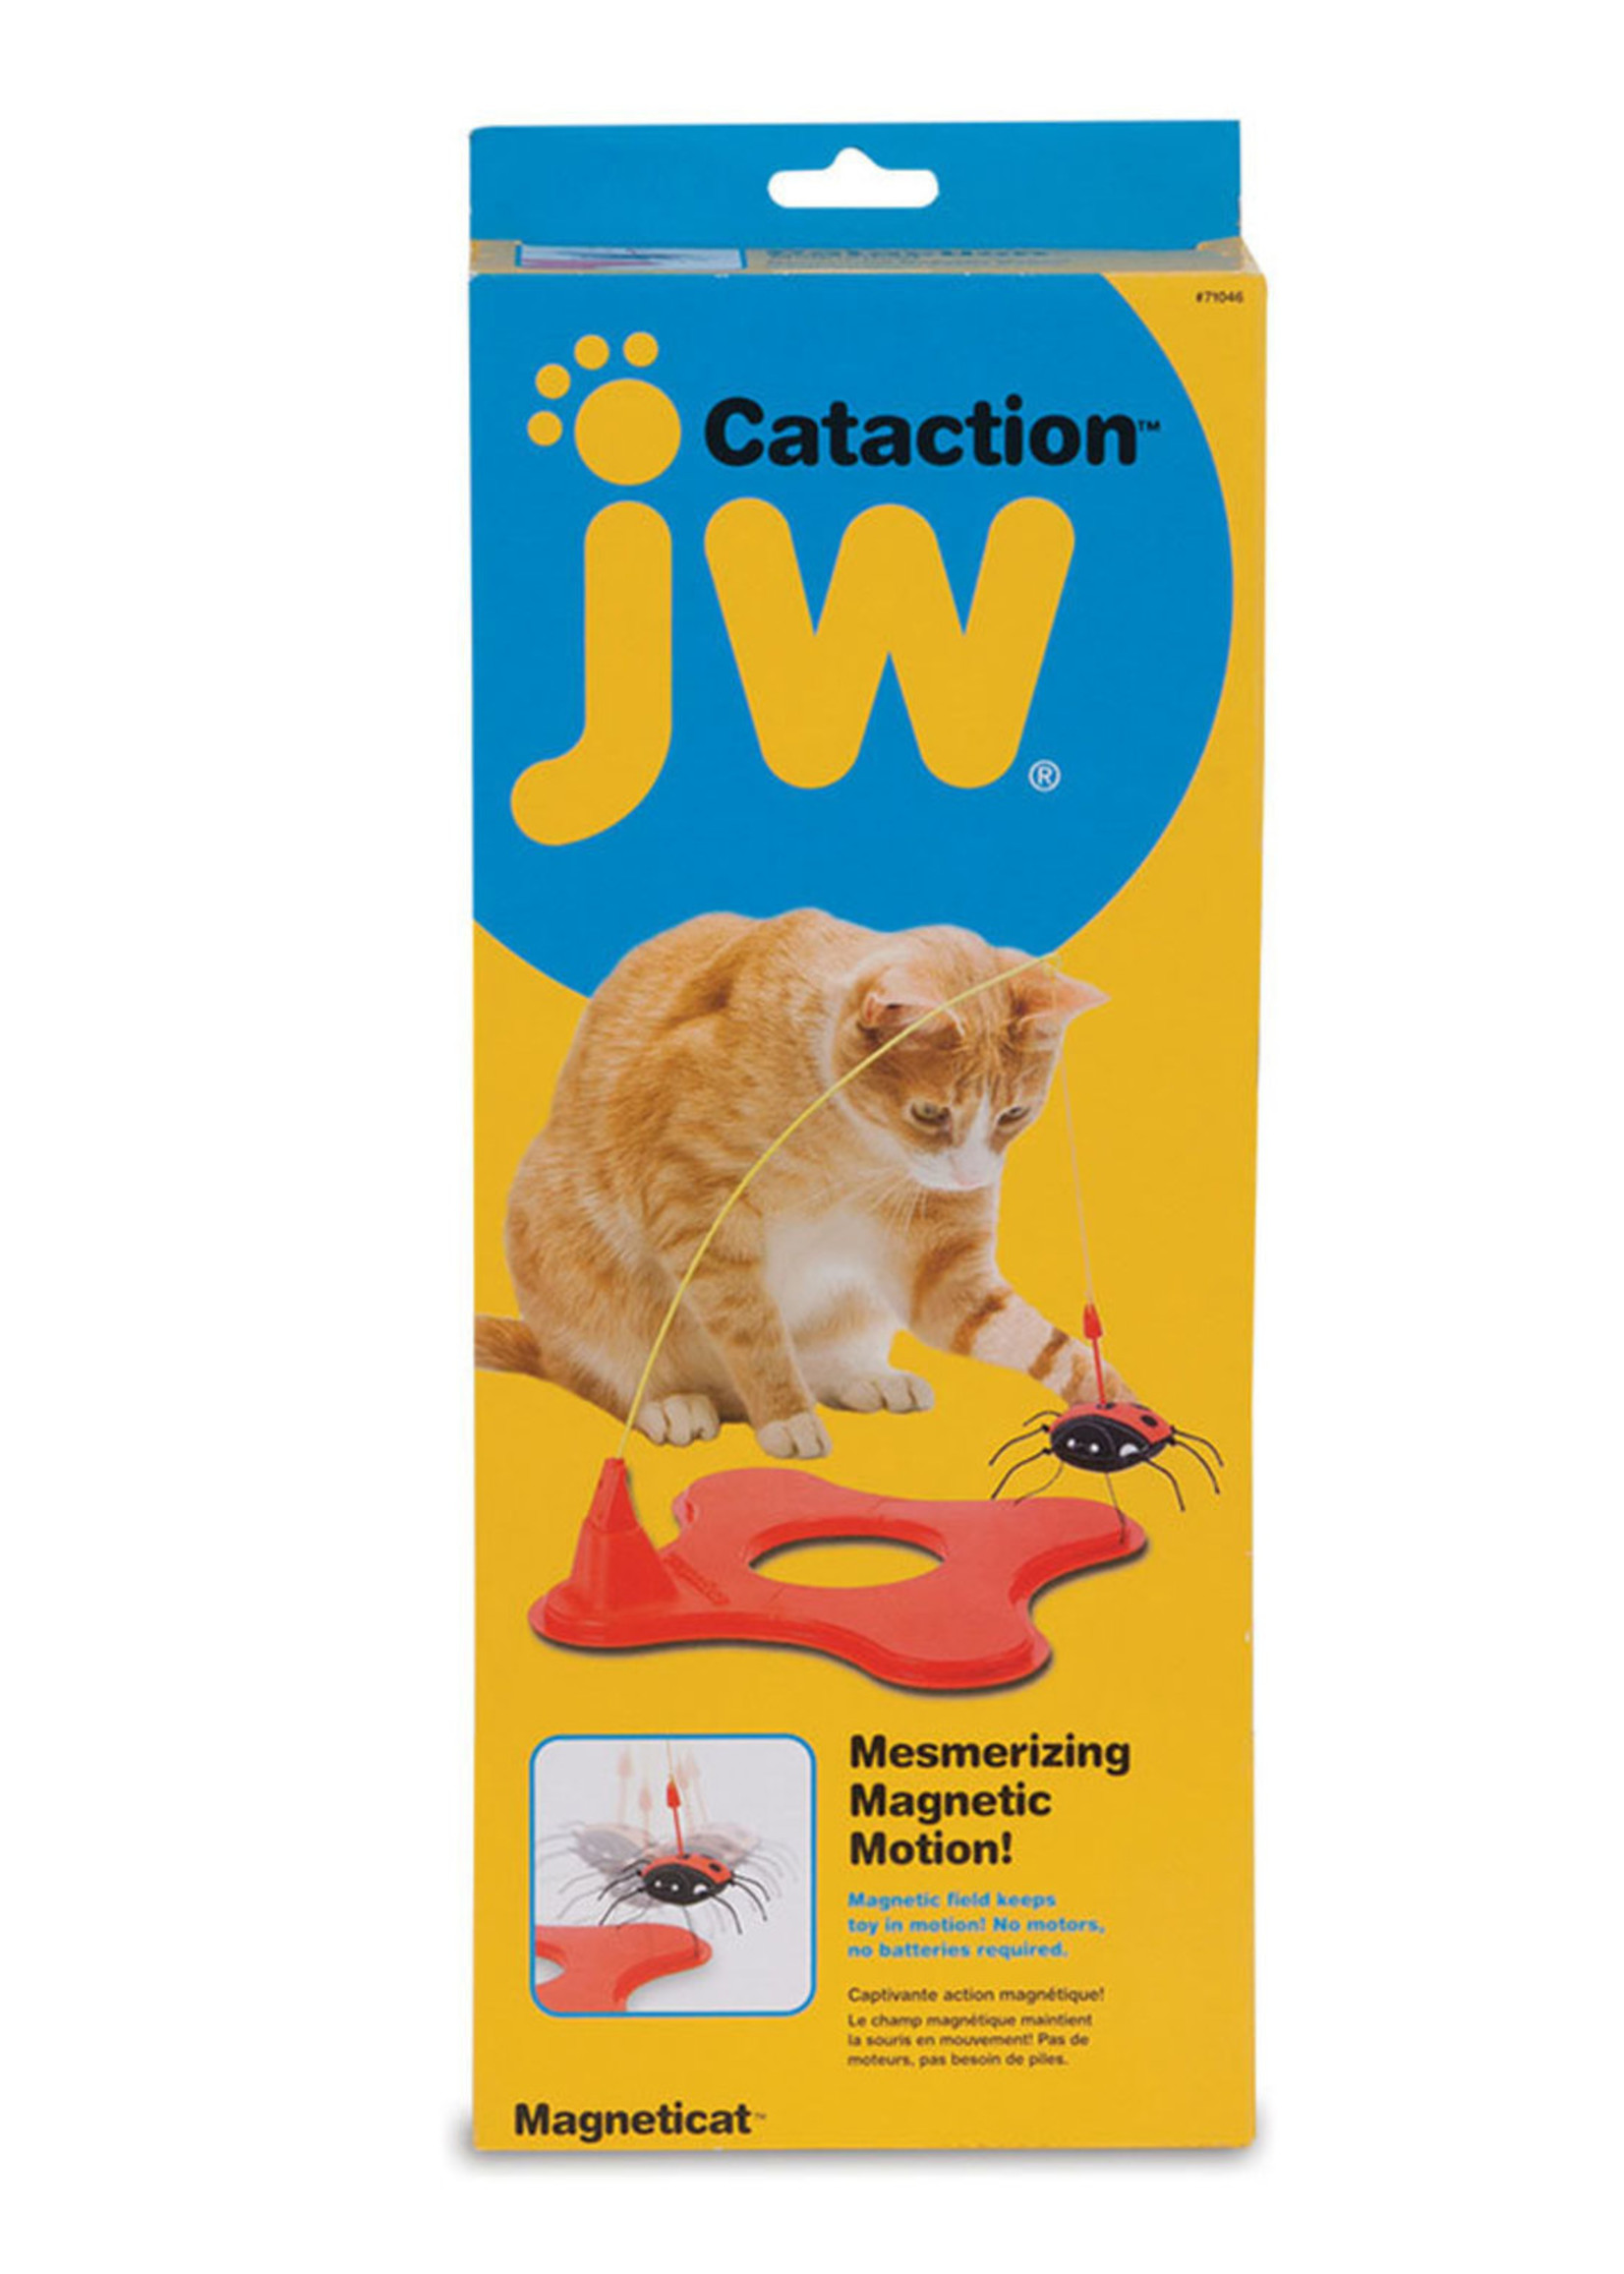 JW® JW Cataction™ Magneticat Toy